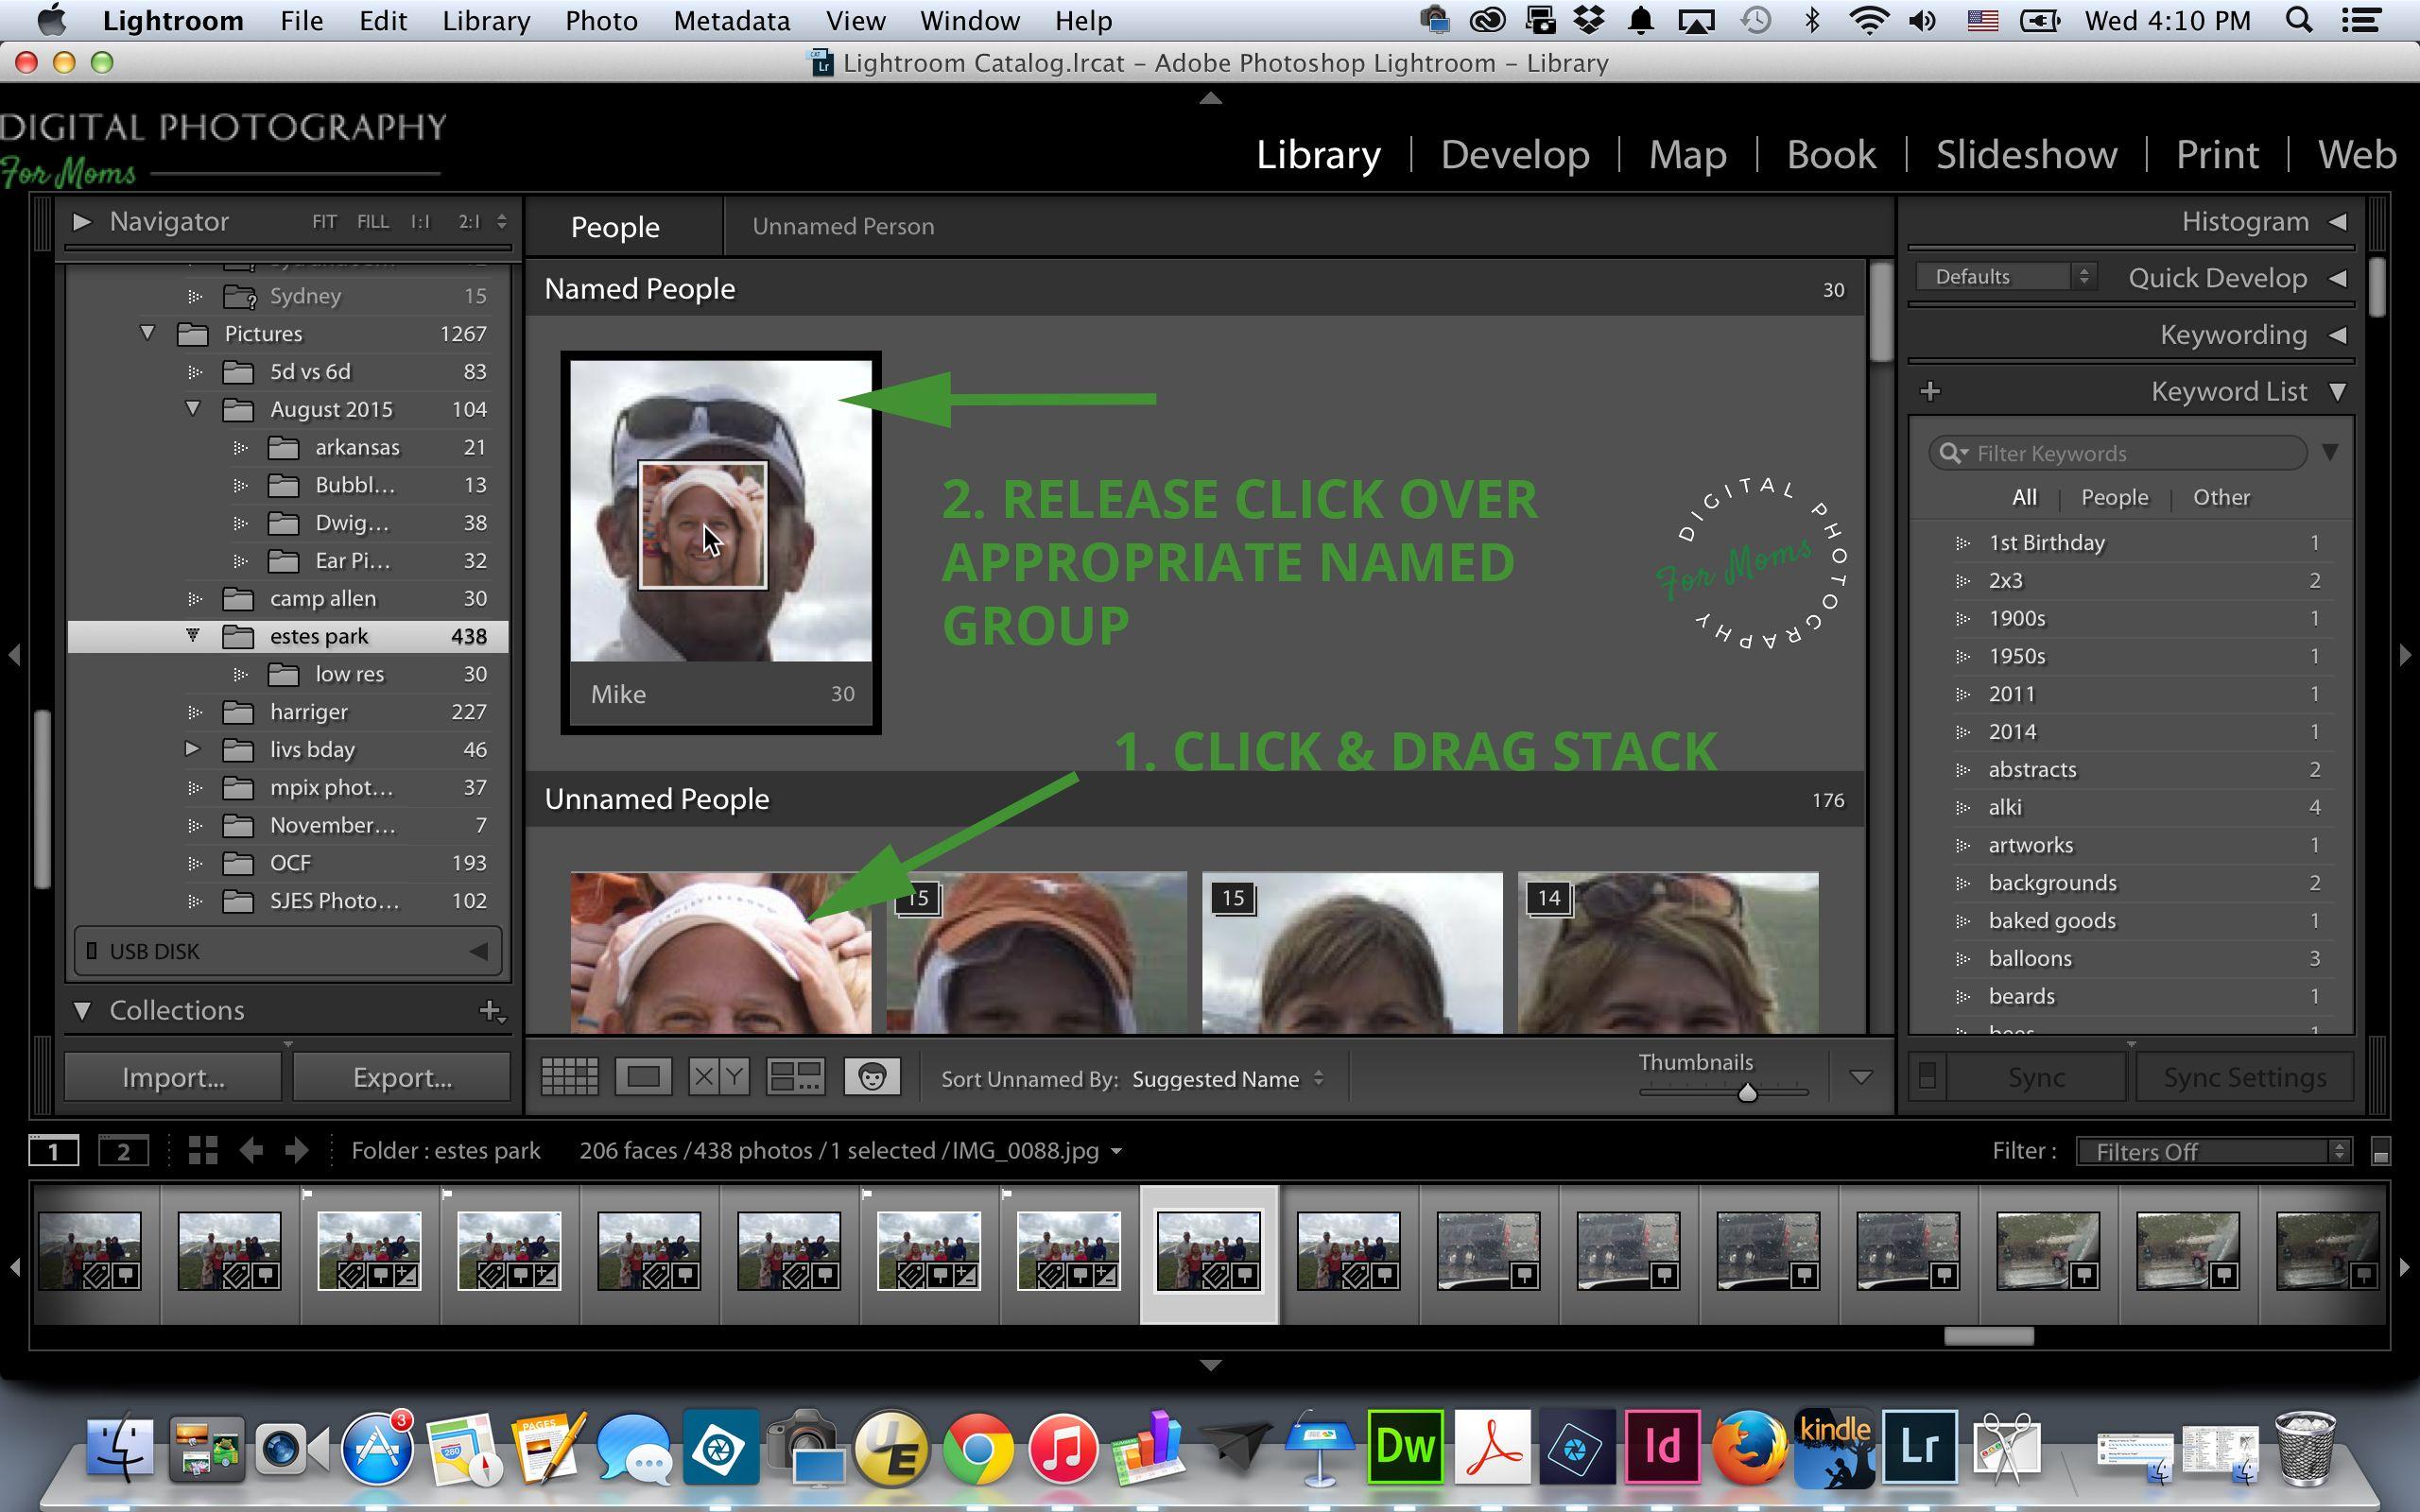 Lightroom Facial Recognition Video Tutorial via @Digital Photography for Moms